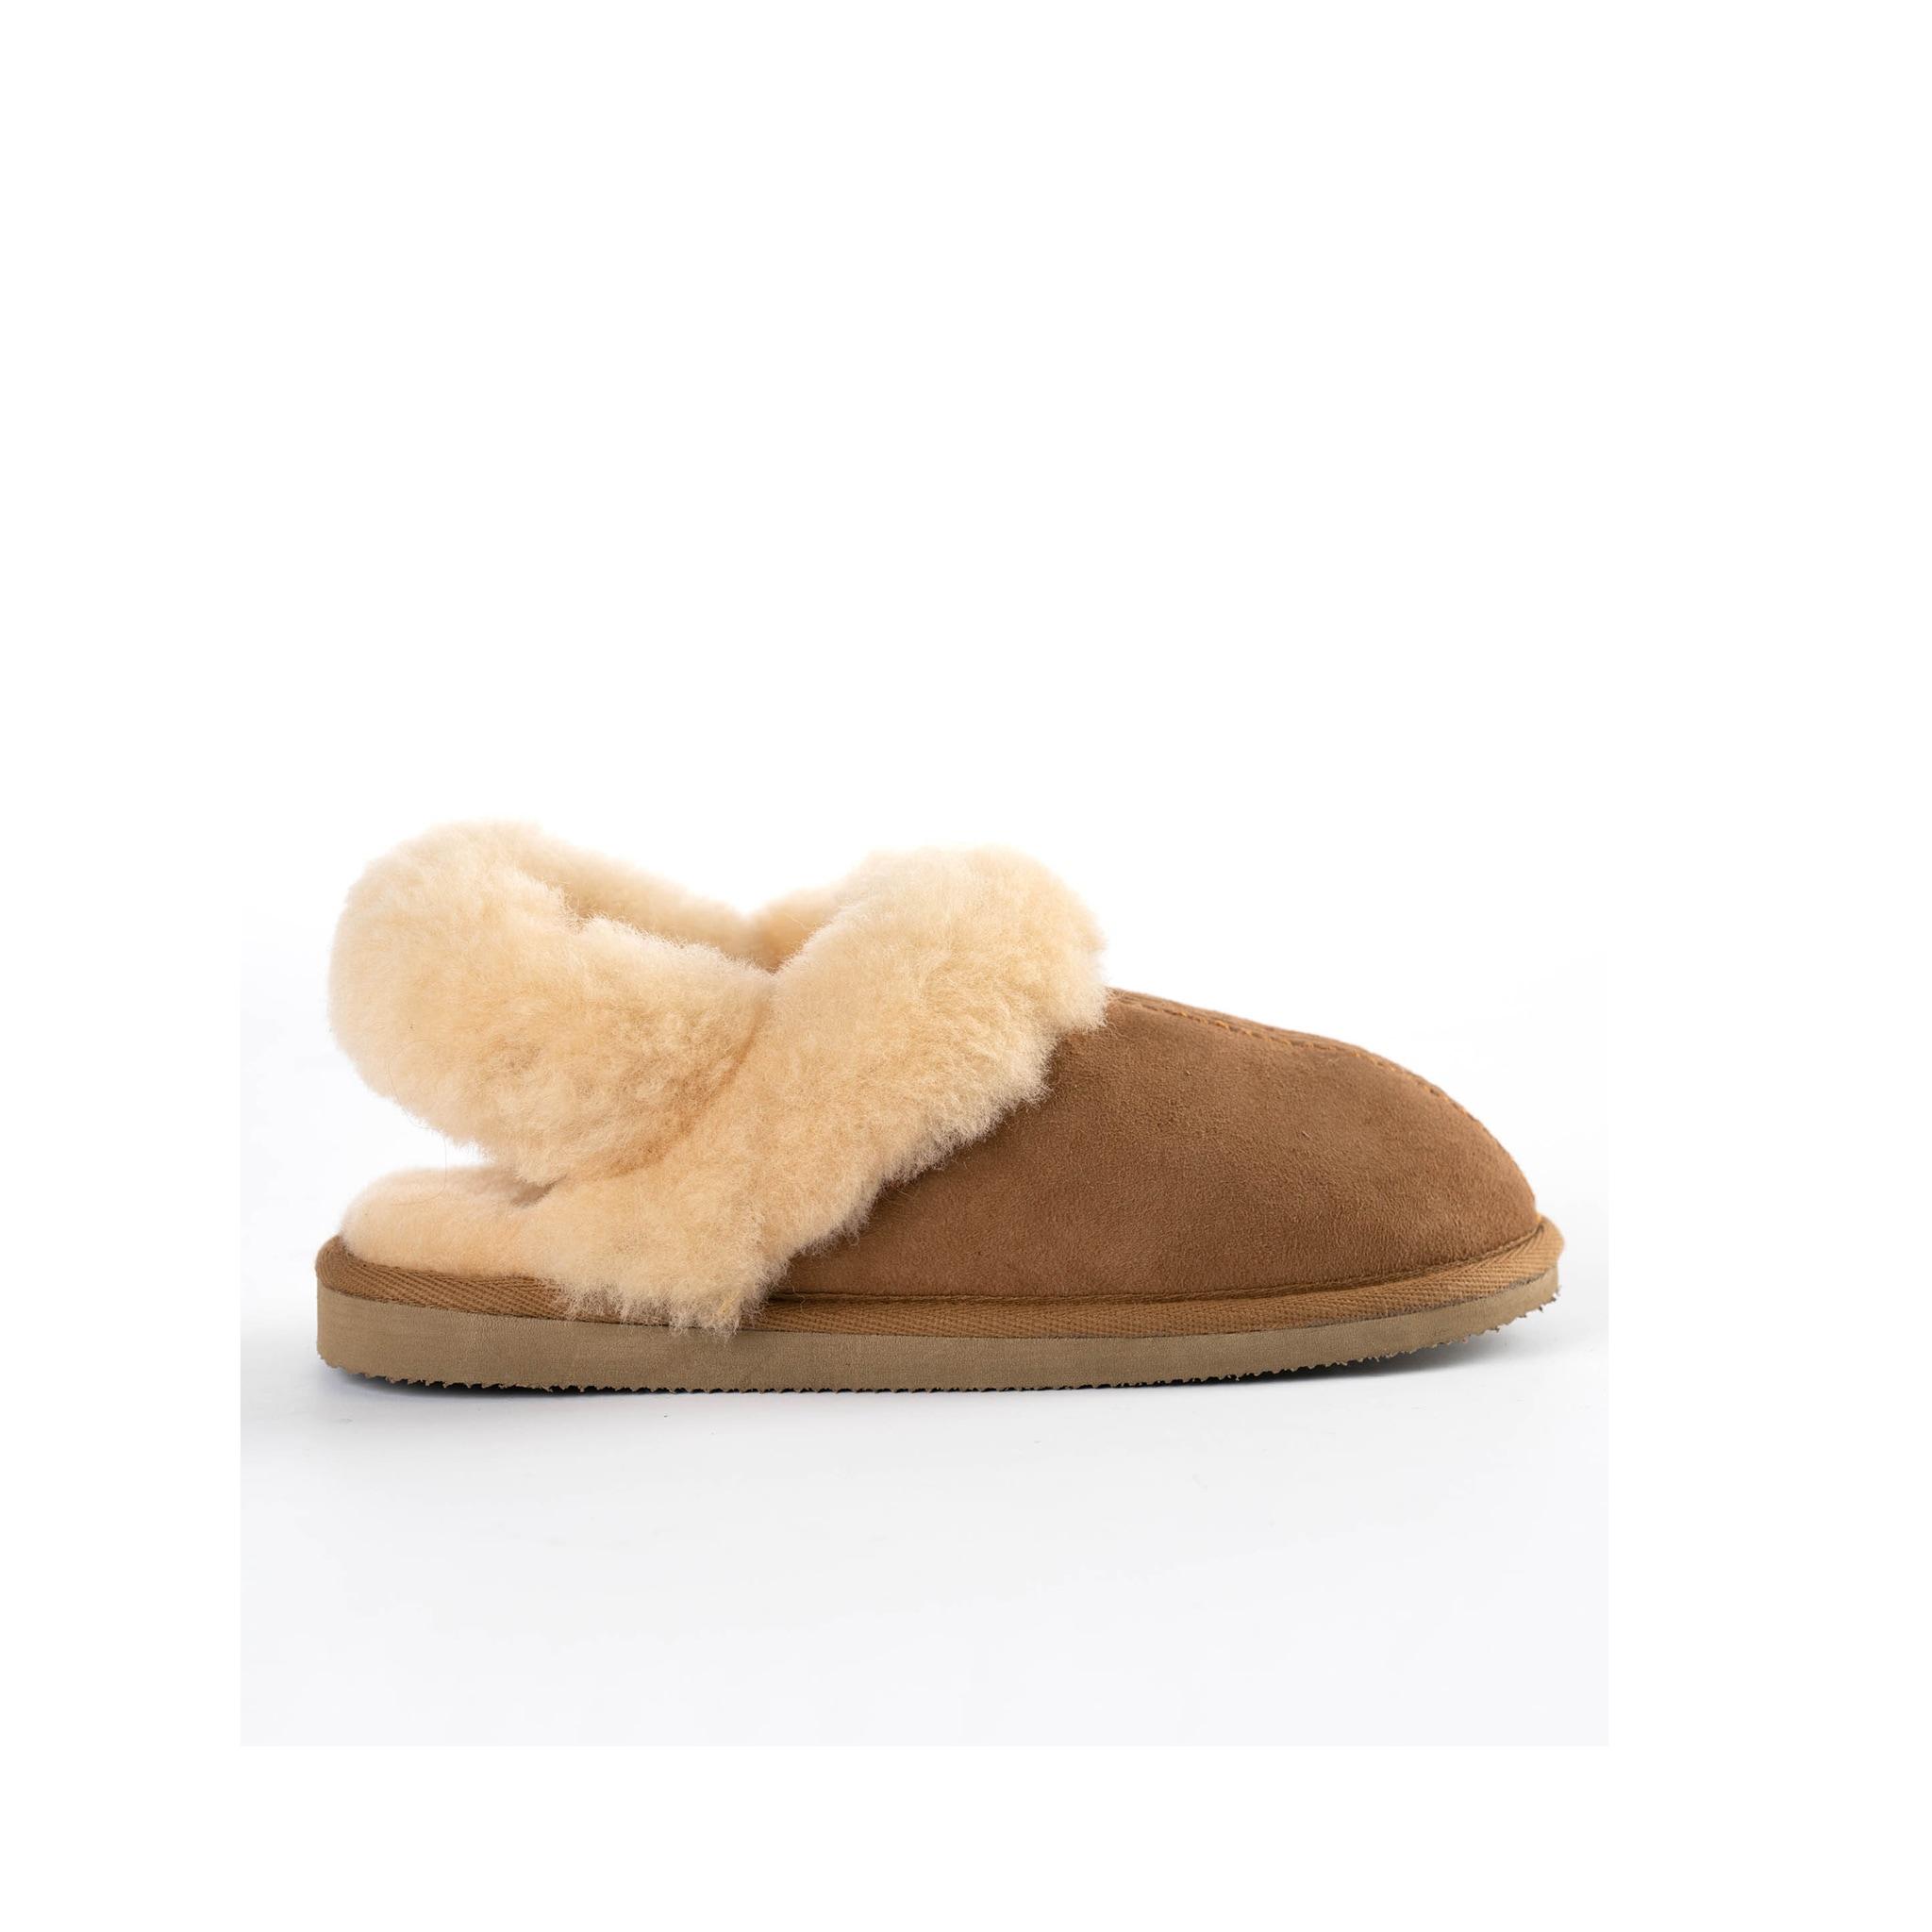 Edith slippers